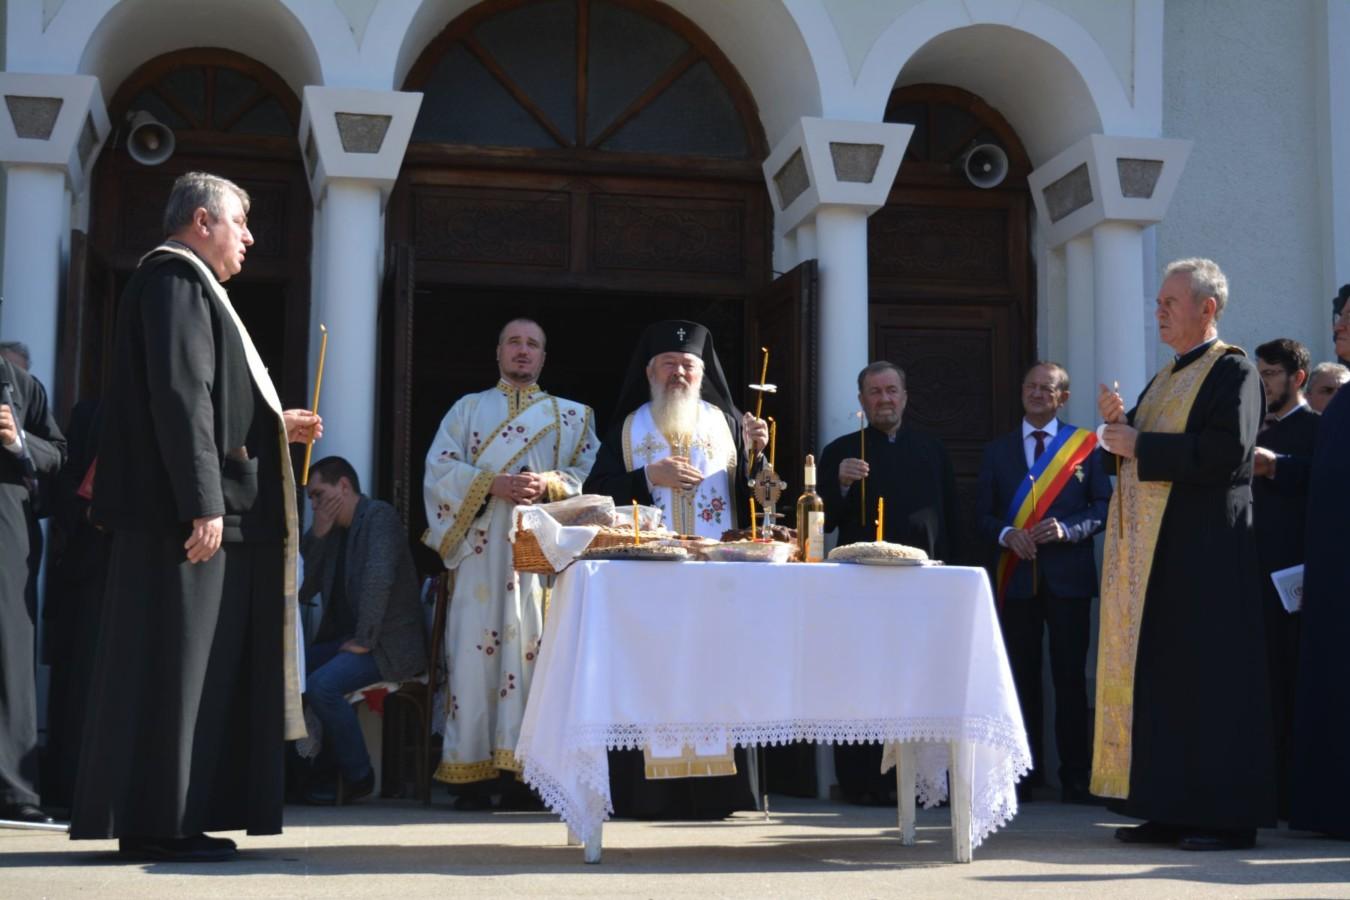 100 de ani de la martiriul preotului Ioan Opriș, comemorați la Turda